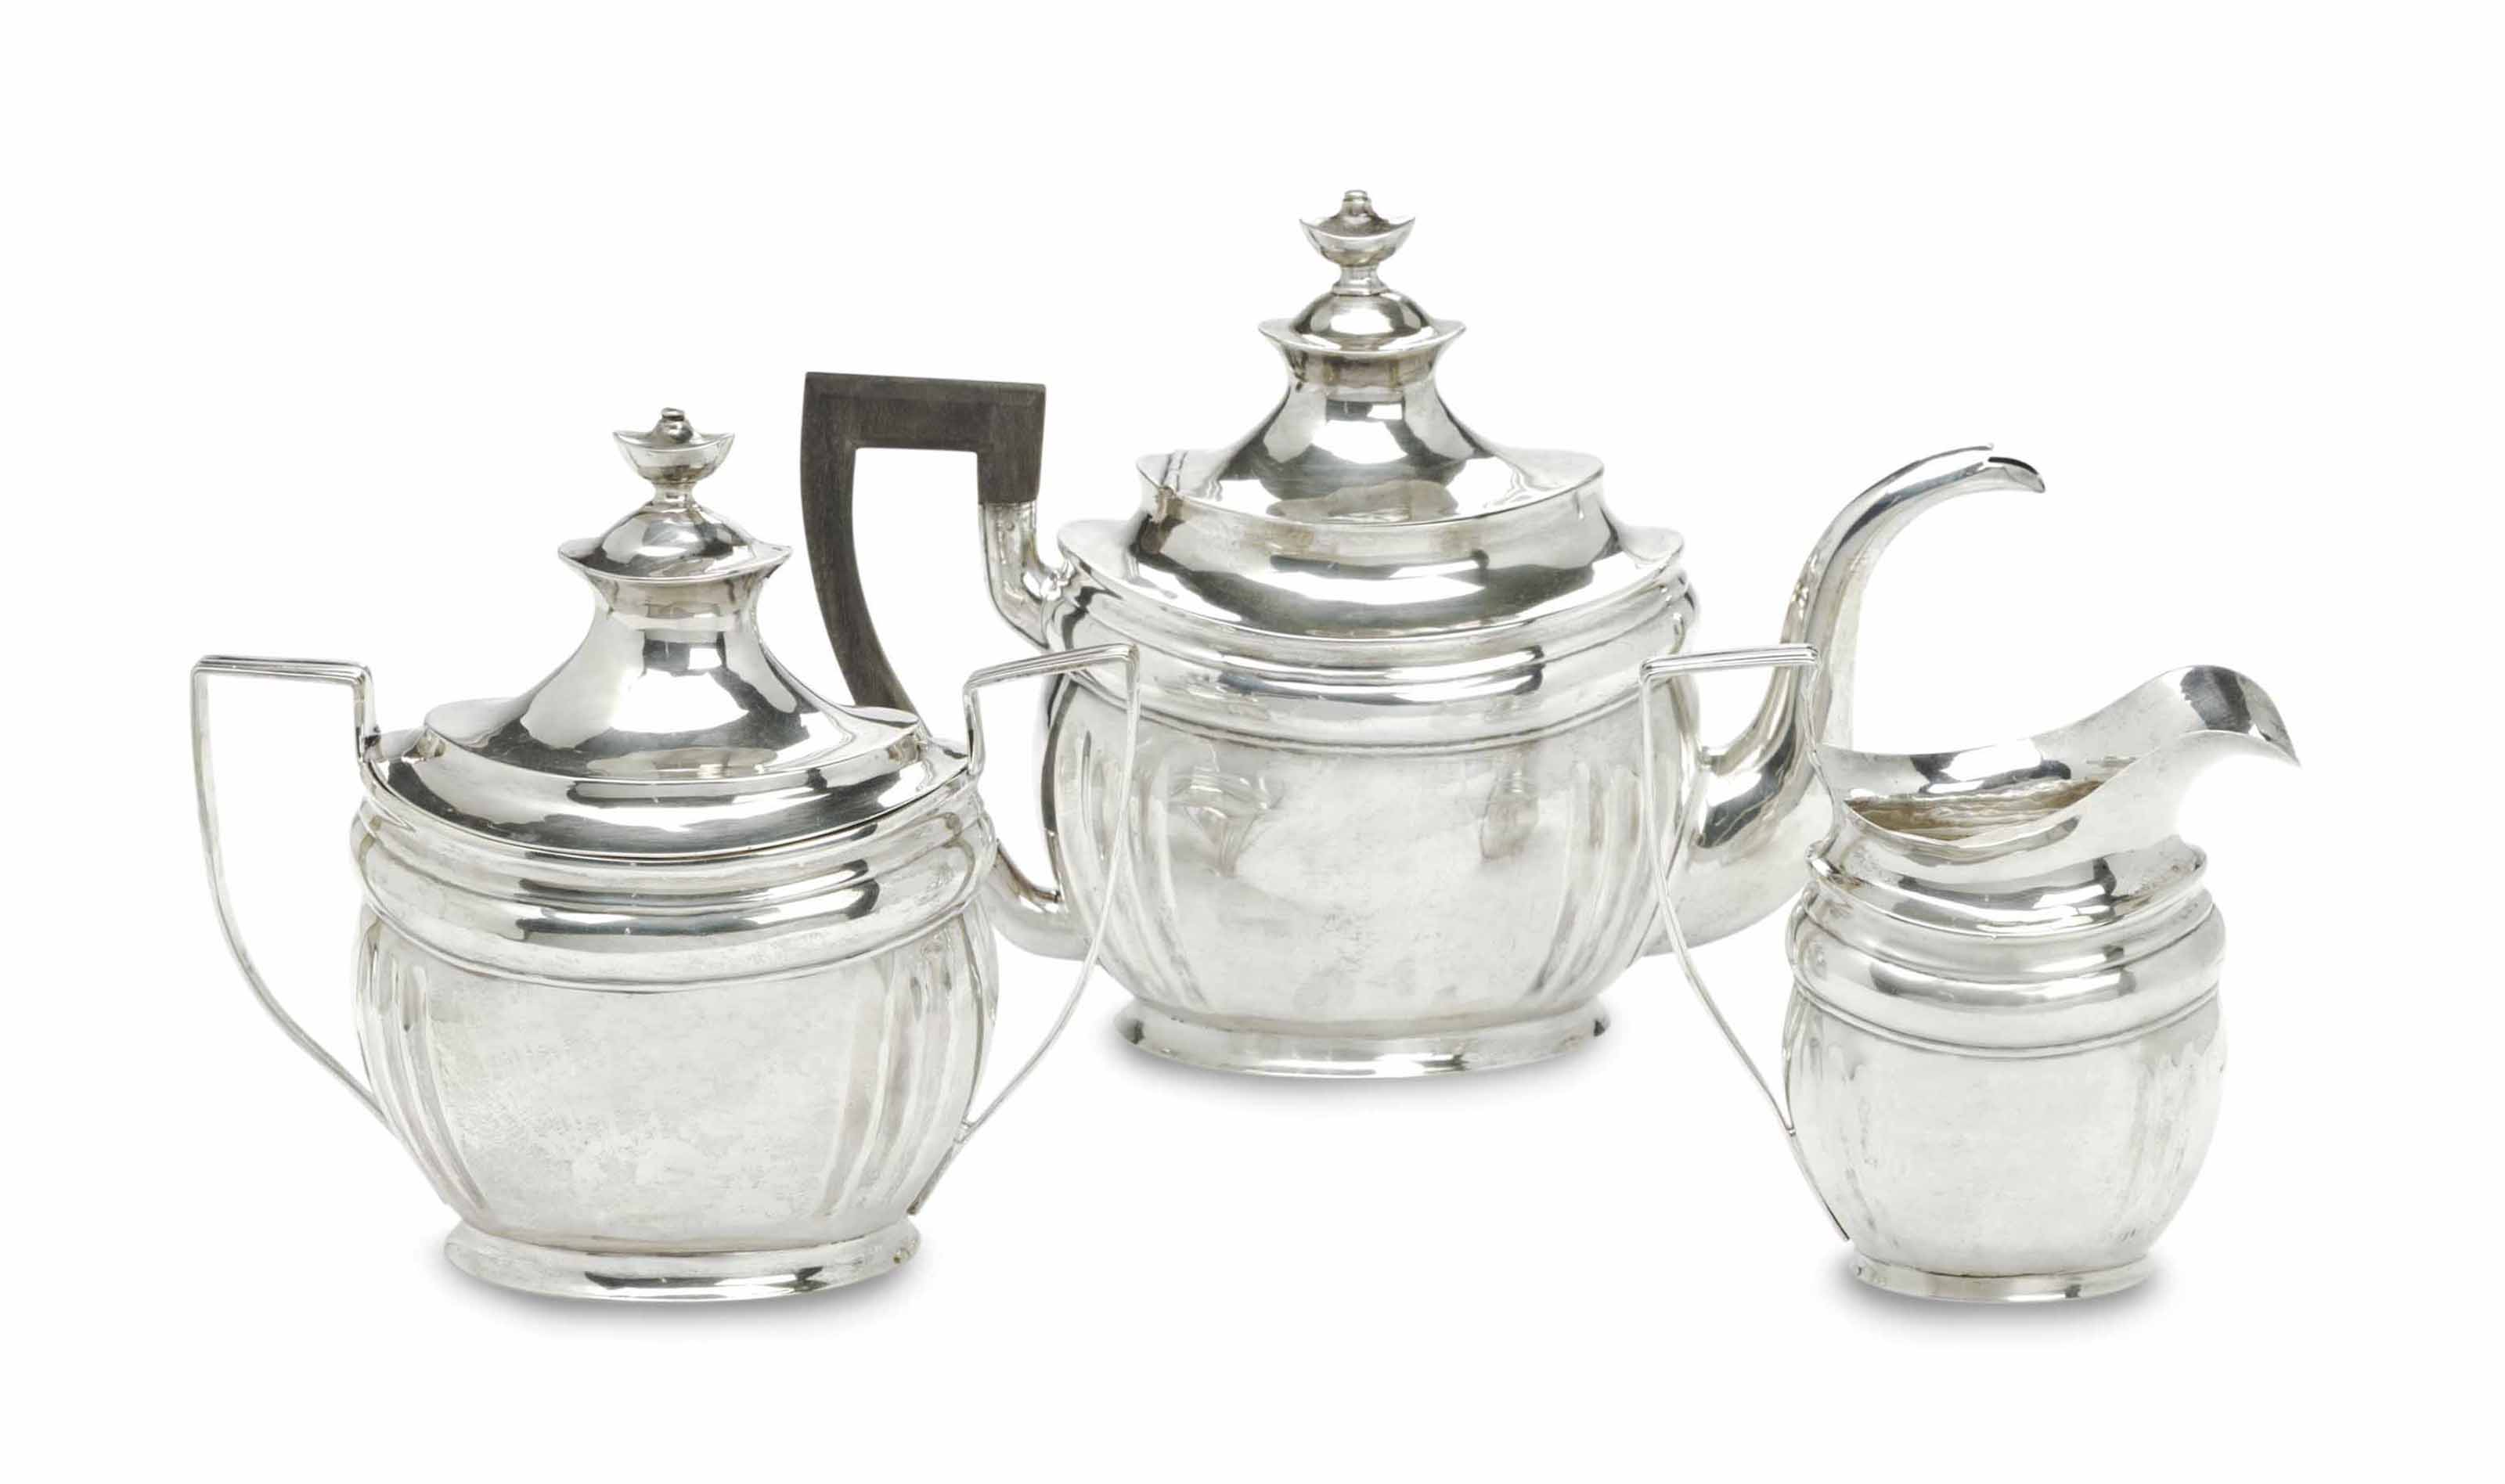 AN EARLY AMERICAN SILVER THREE-PIECE TEA SERVICE,